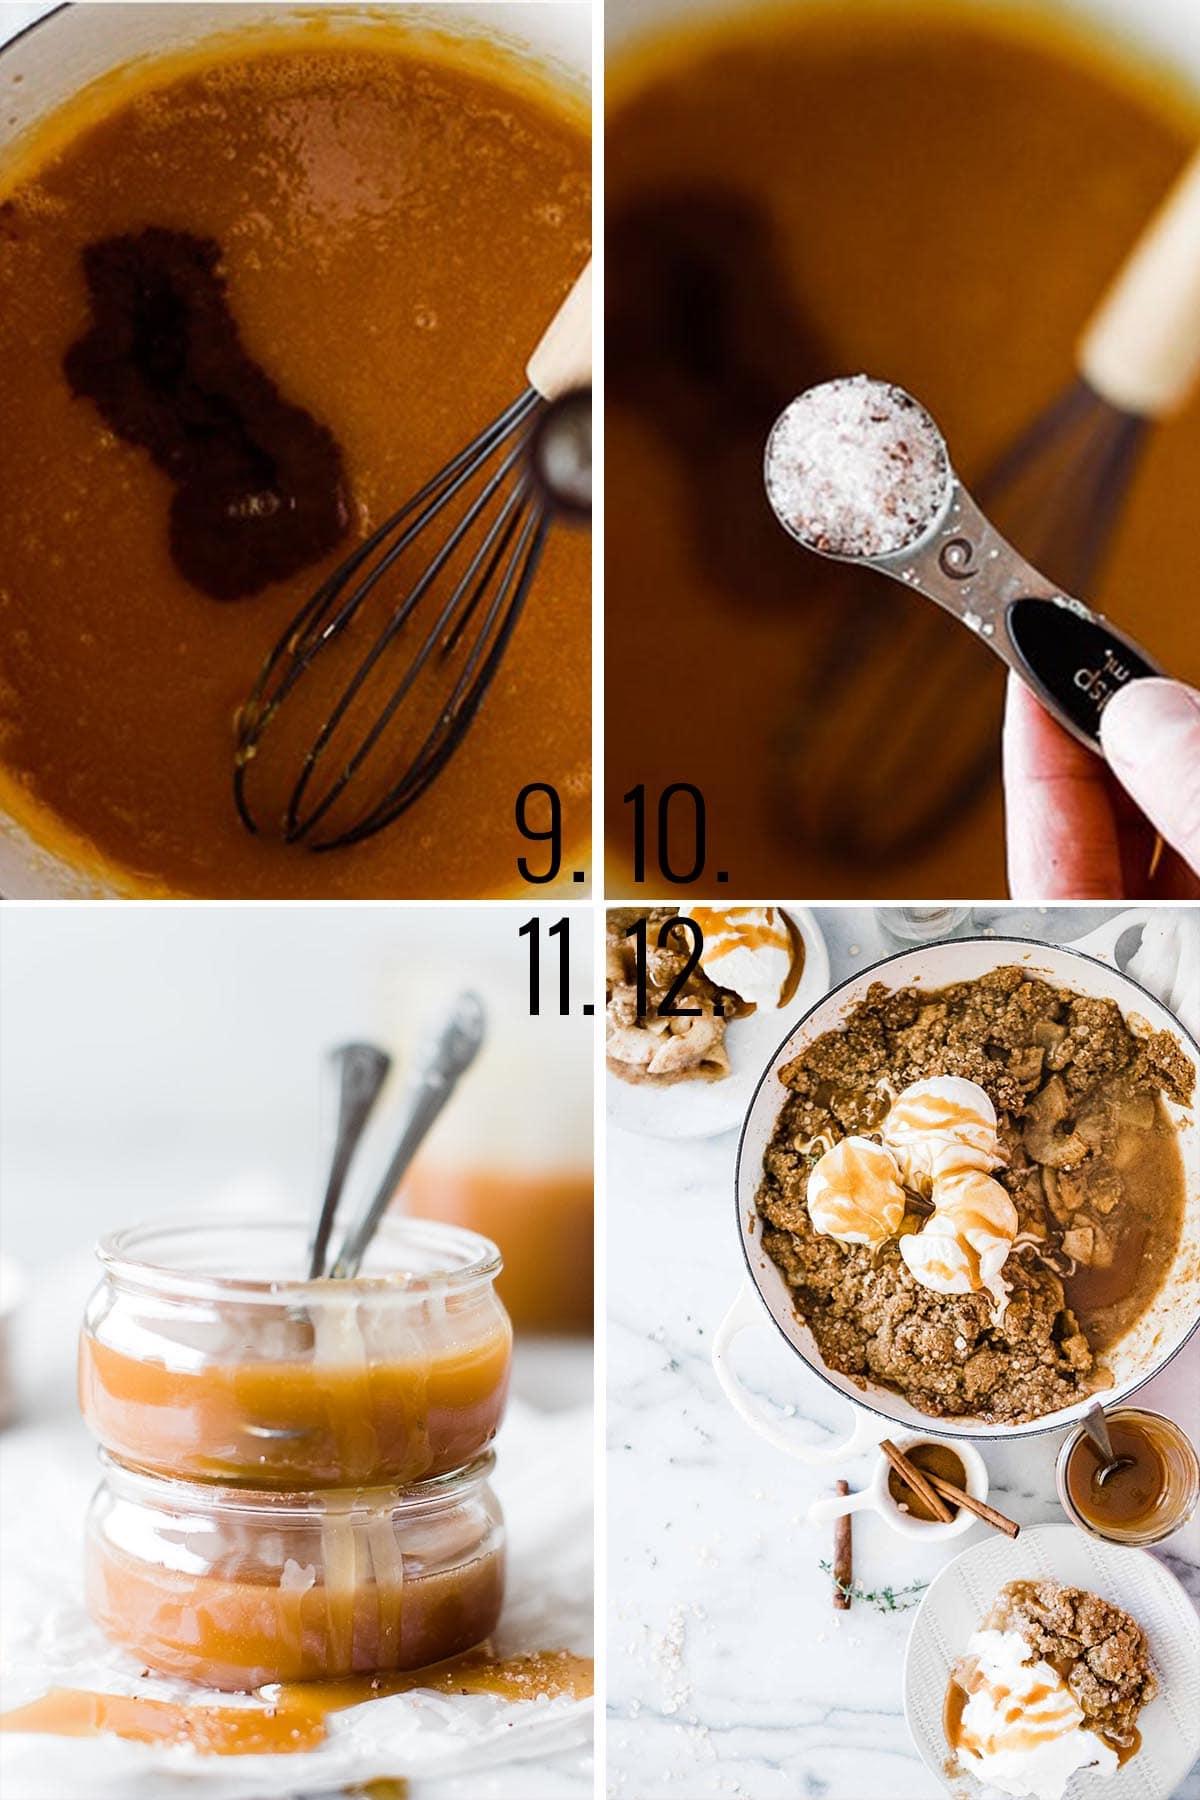 How to make caramel - add vanilla and salt.